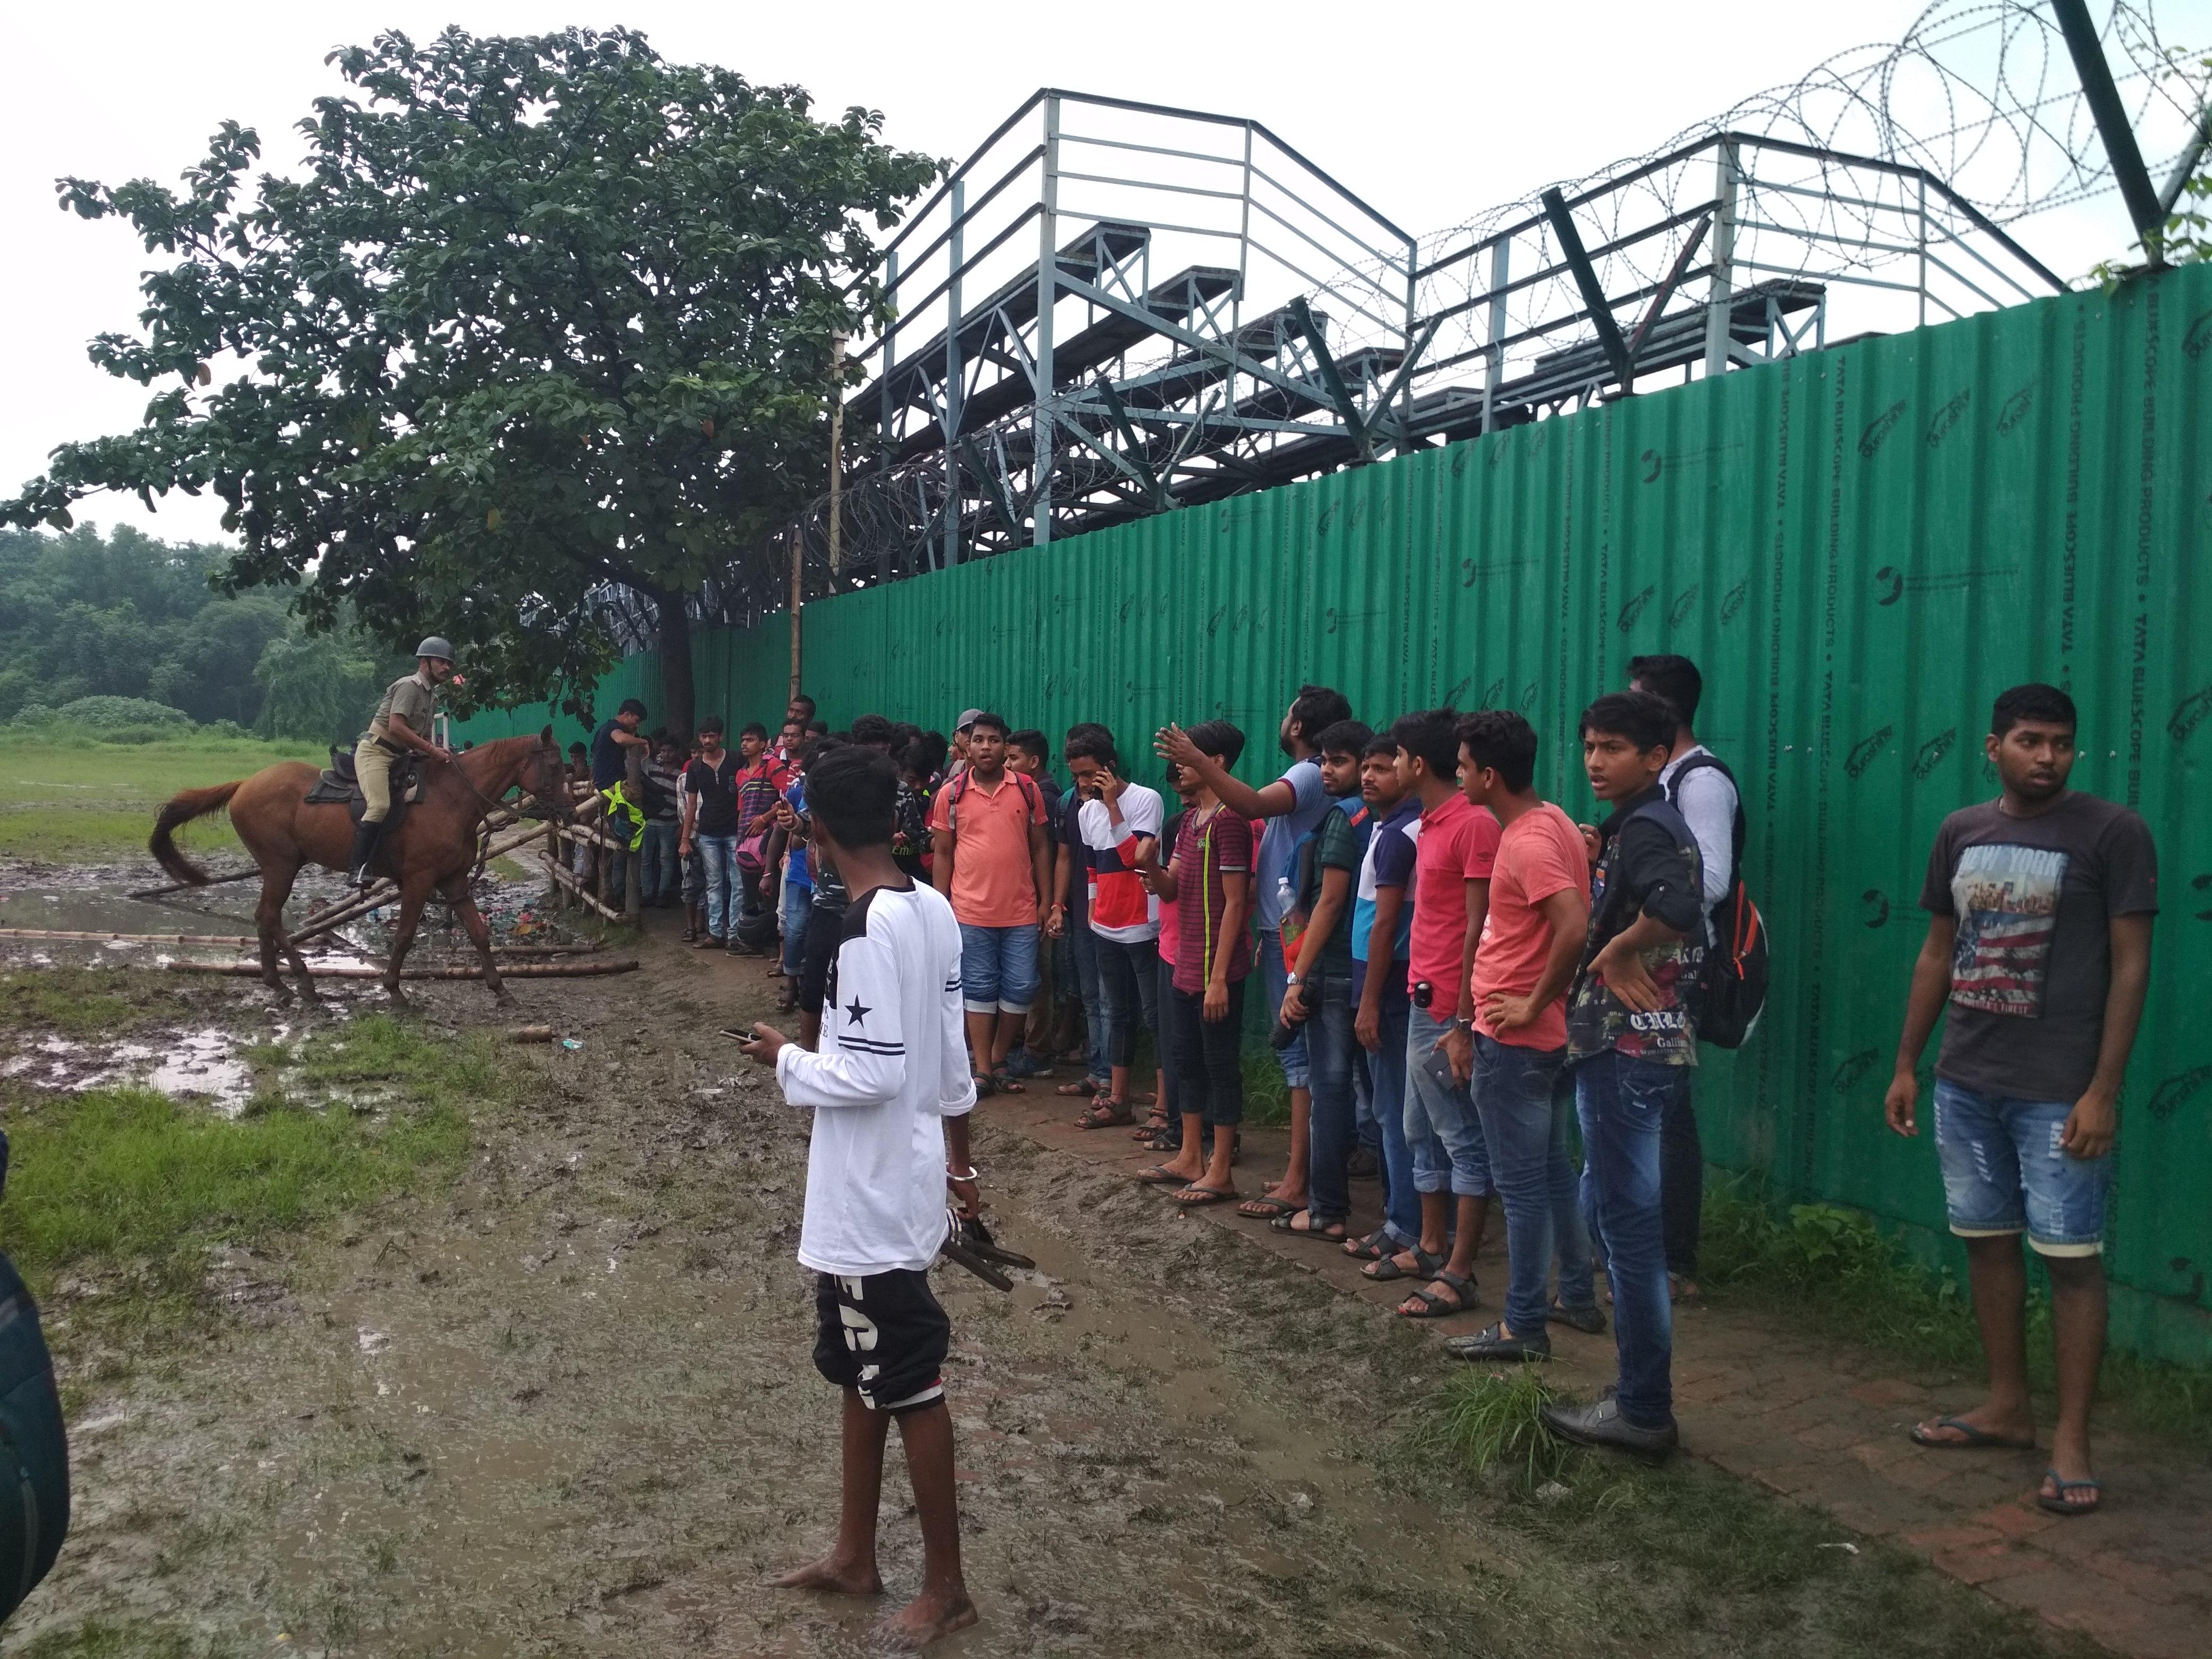 Mohun Bagan ticket line